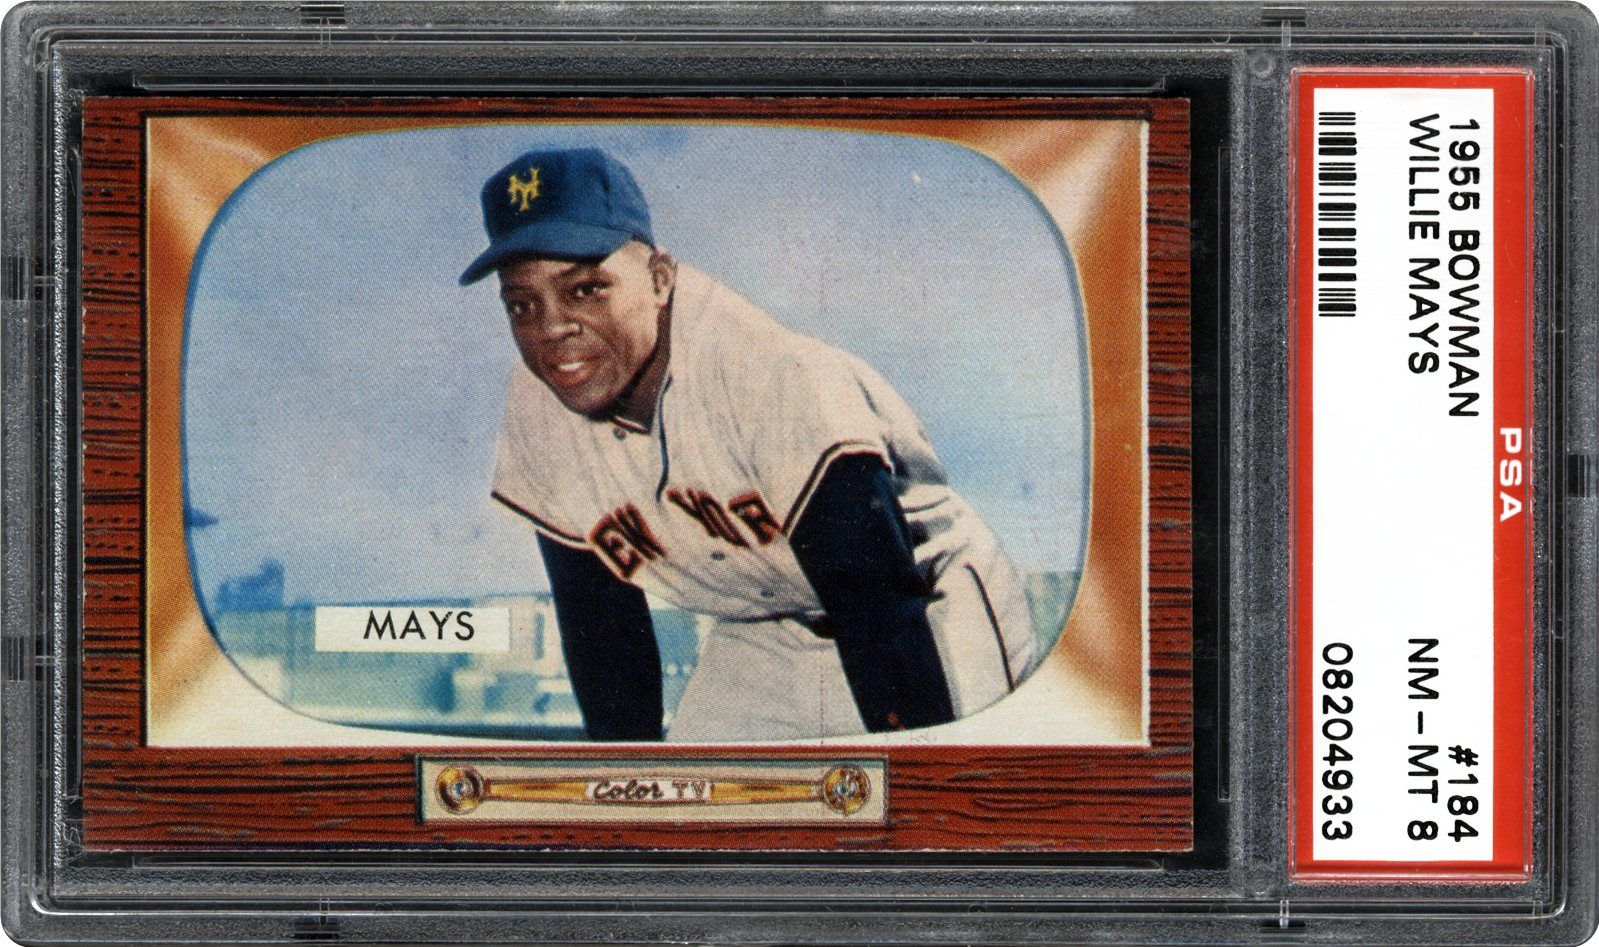 1955 Bowman Baseball Cards Psa Smr Price Guide